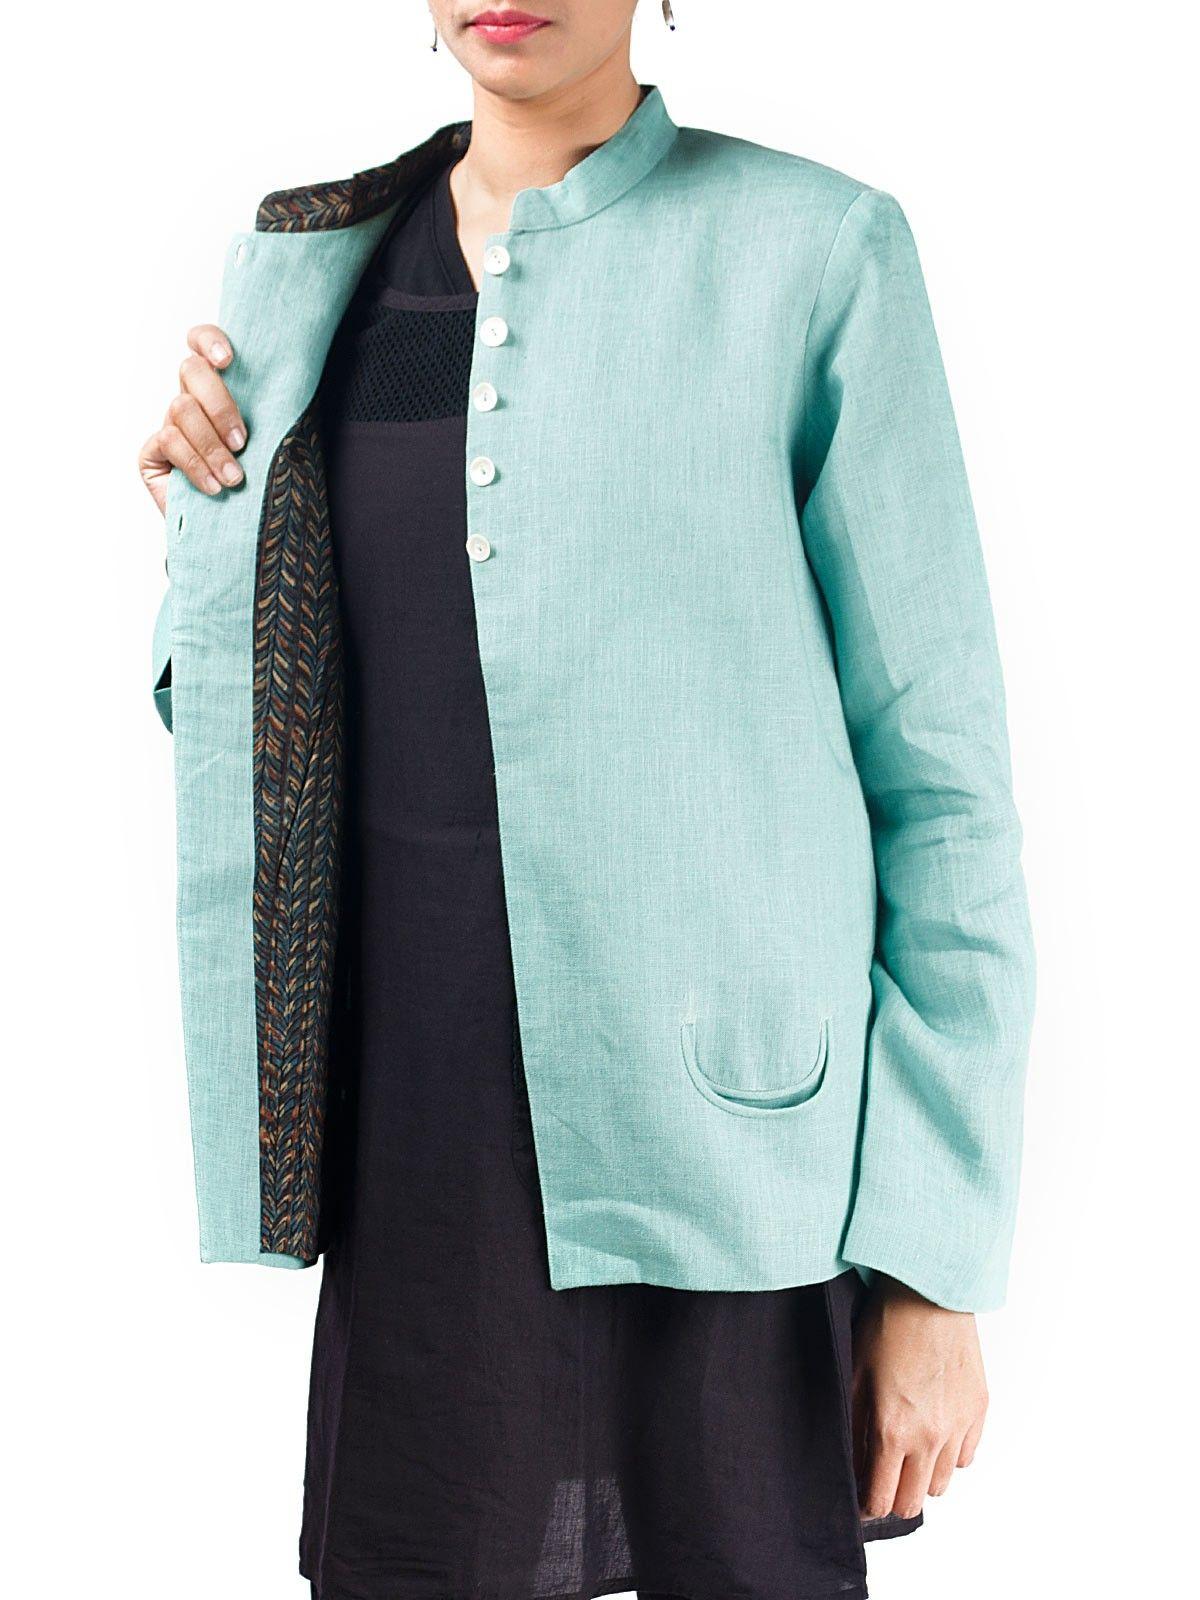 Light blue linen full sleeves short winter jacket